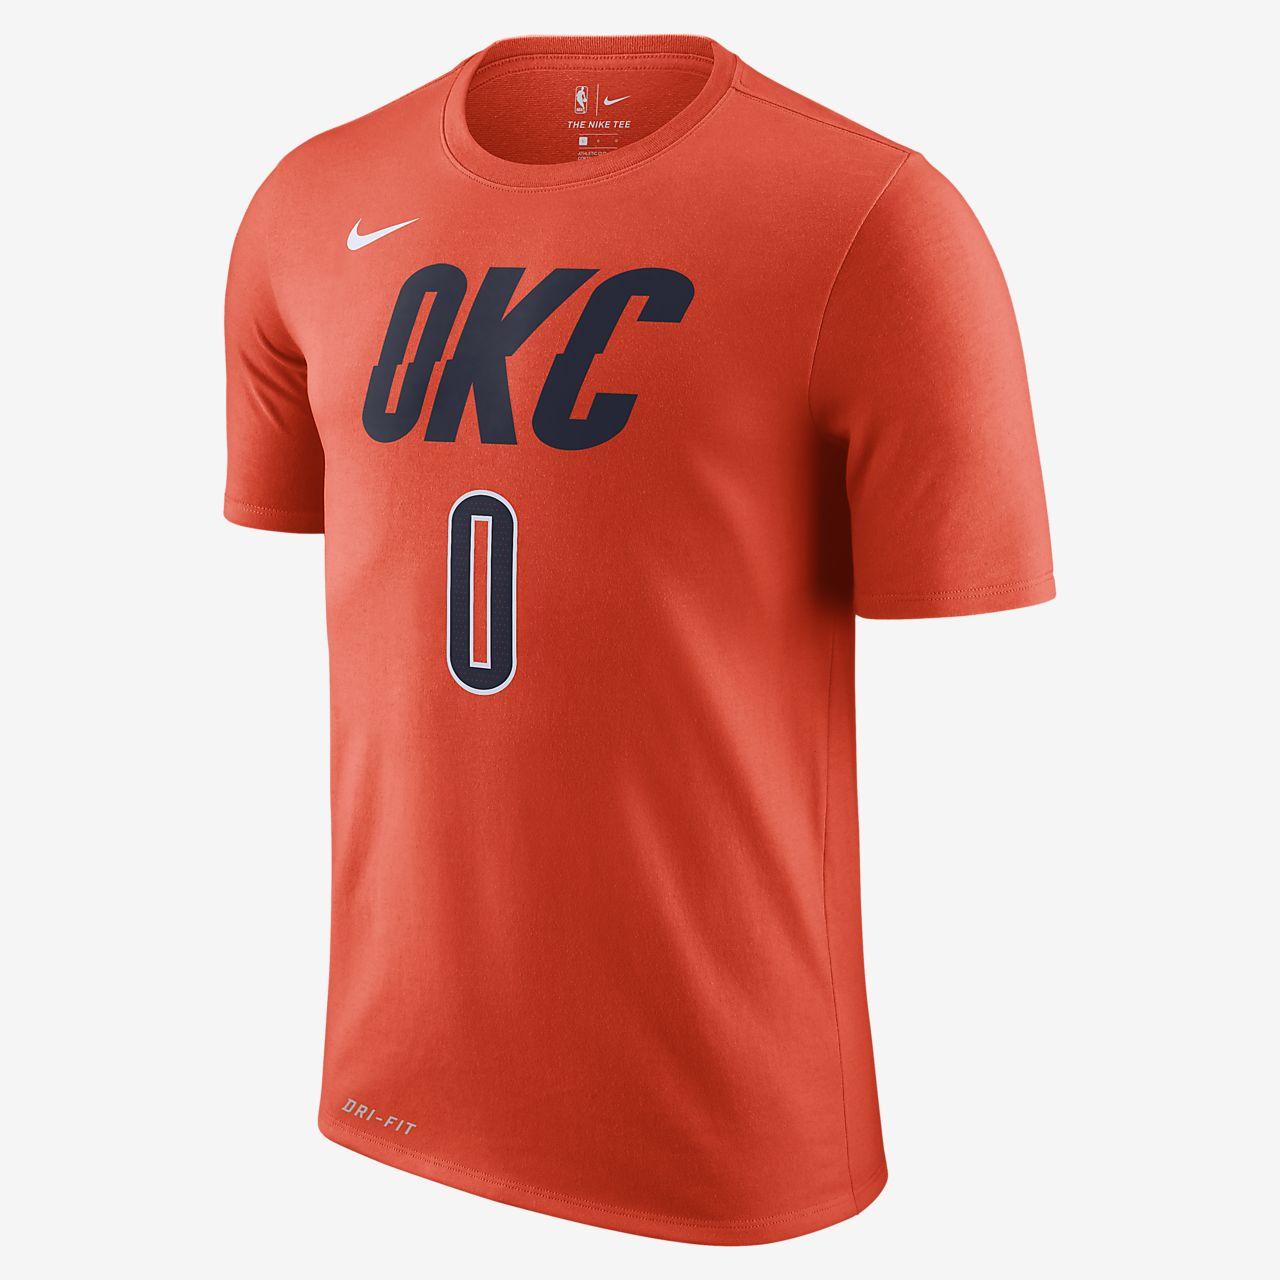 俄克拉荷马城雷霆队 (Russell Westbrook) City Edition Nike Dri-FIT 男子 NBA T恤